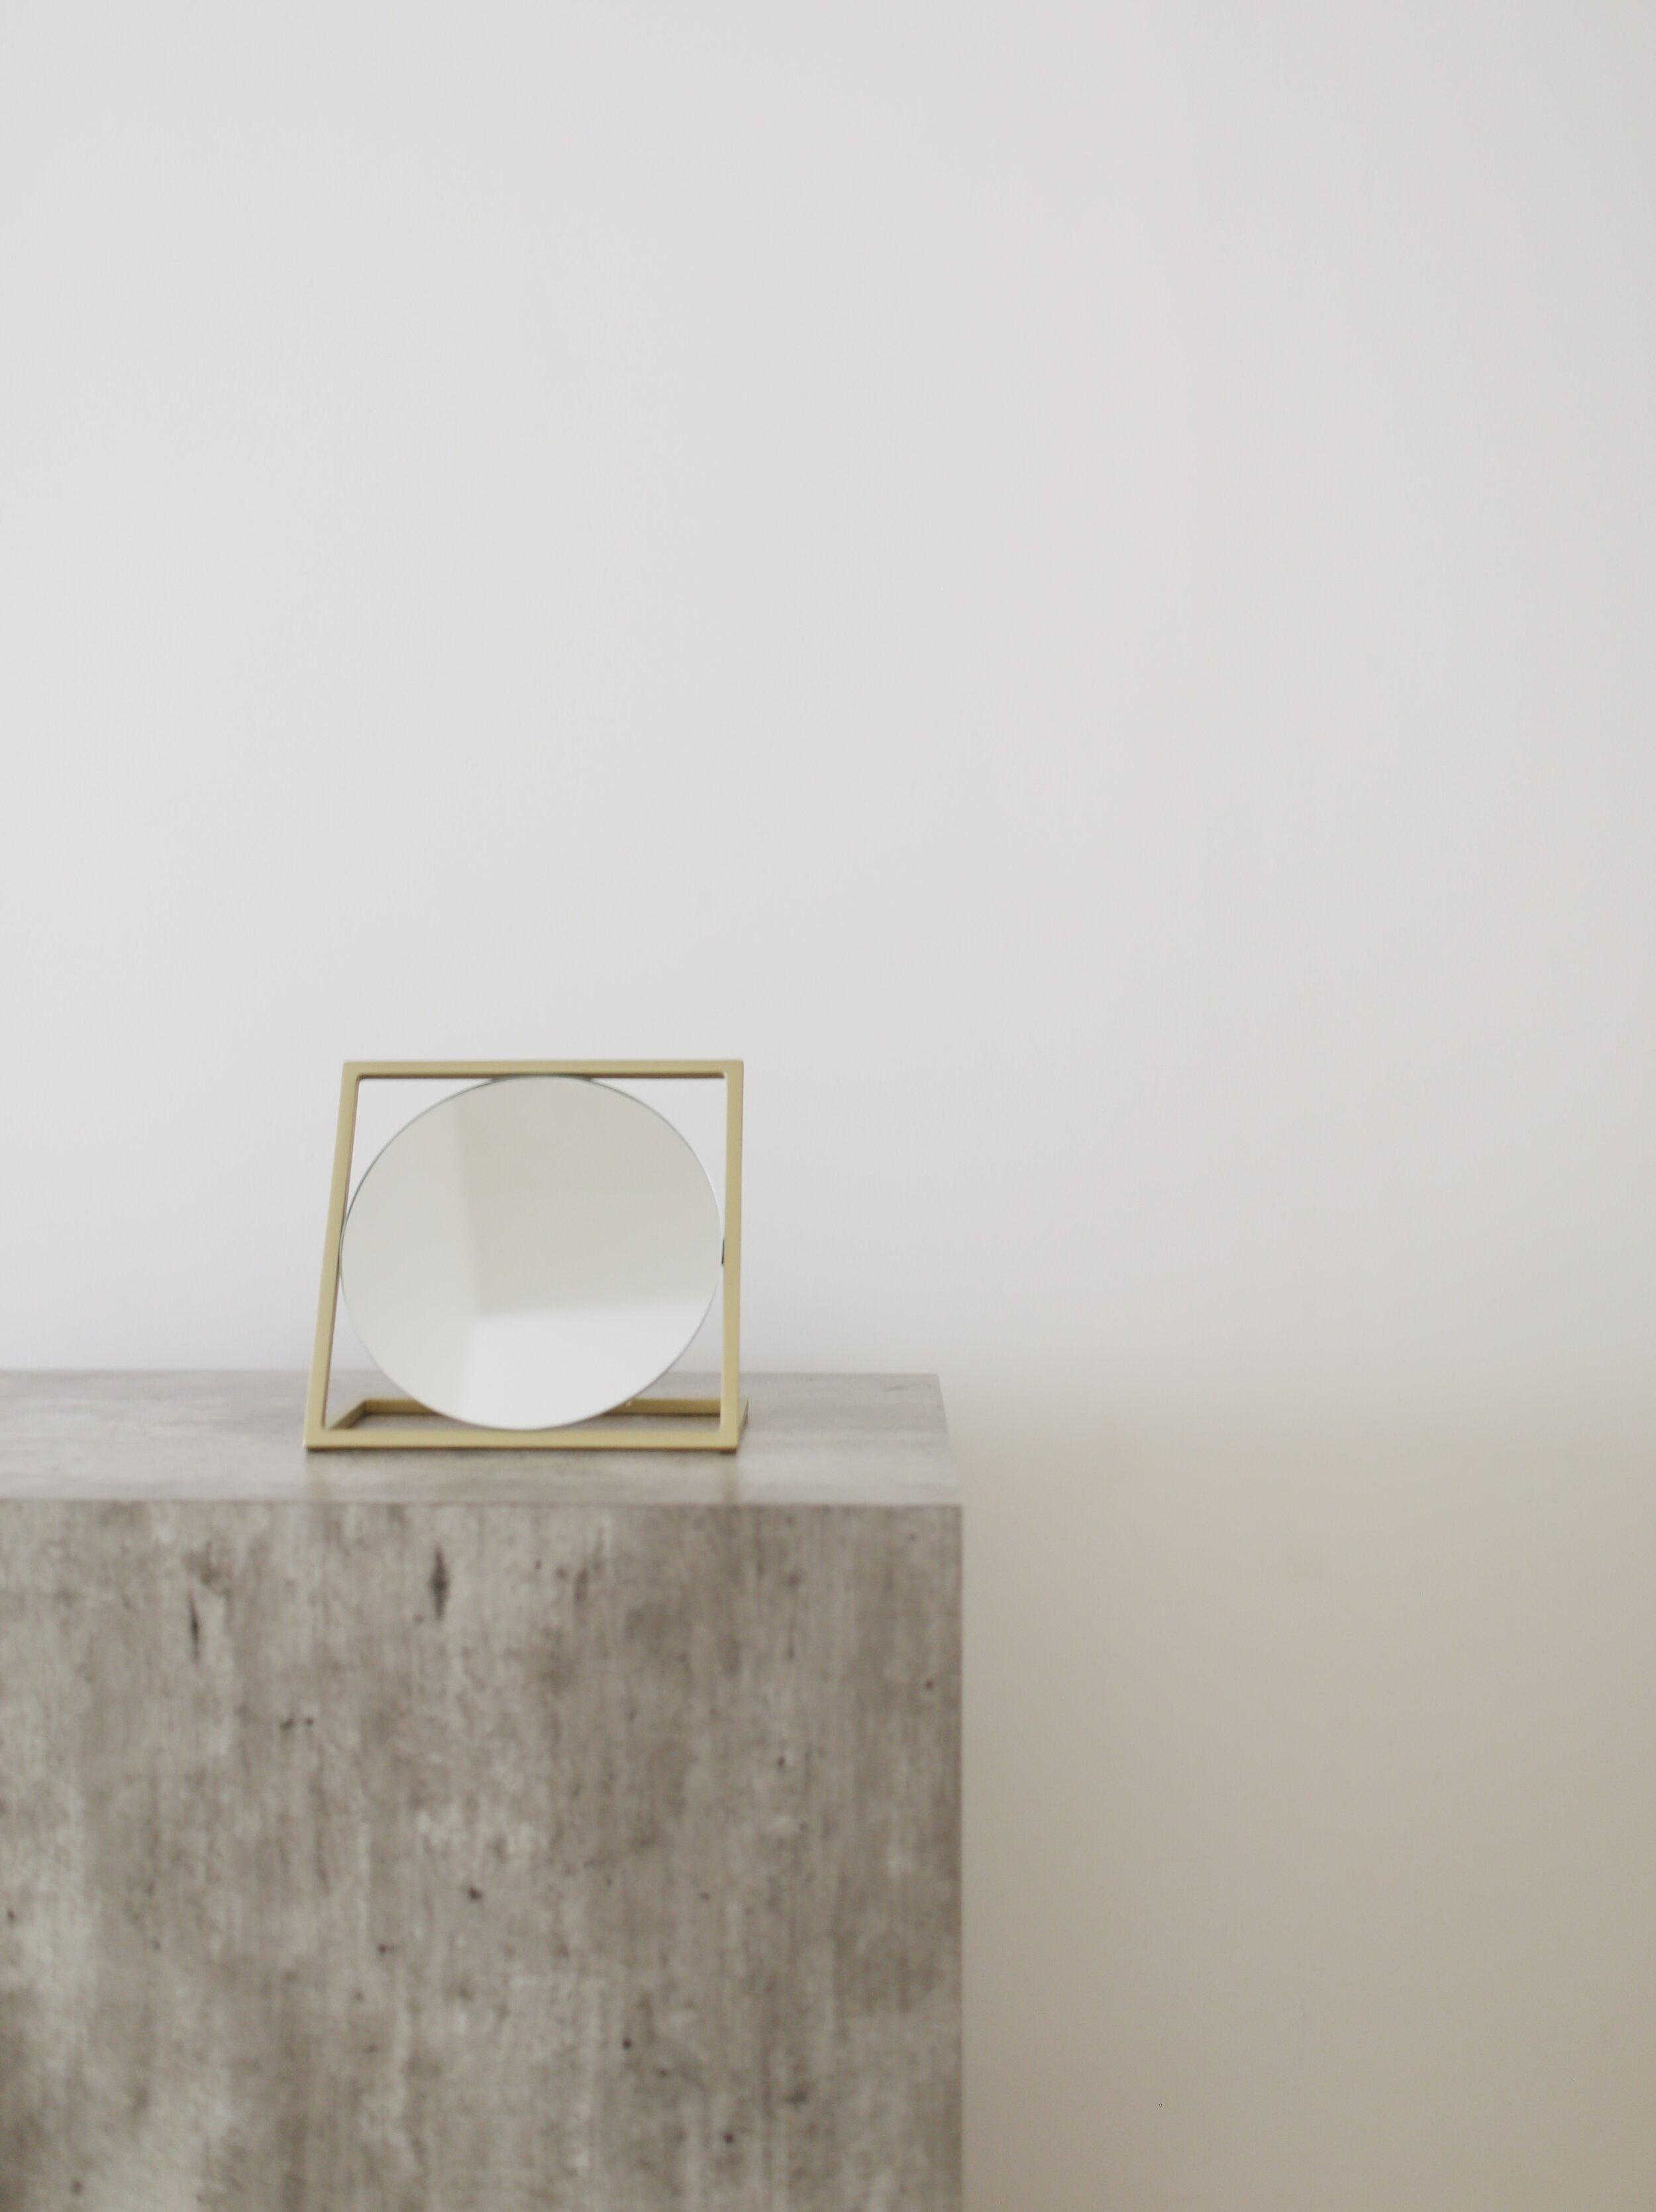 CERMIN   Brass colour finish steel mirror  -   MIRROR DIAMETER   20cm(D)  -   PRICE   Rp. 750.000